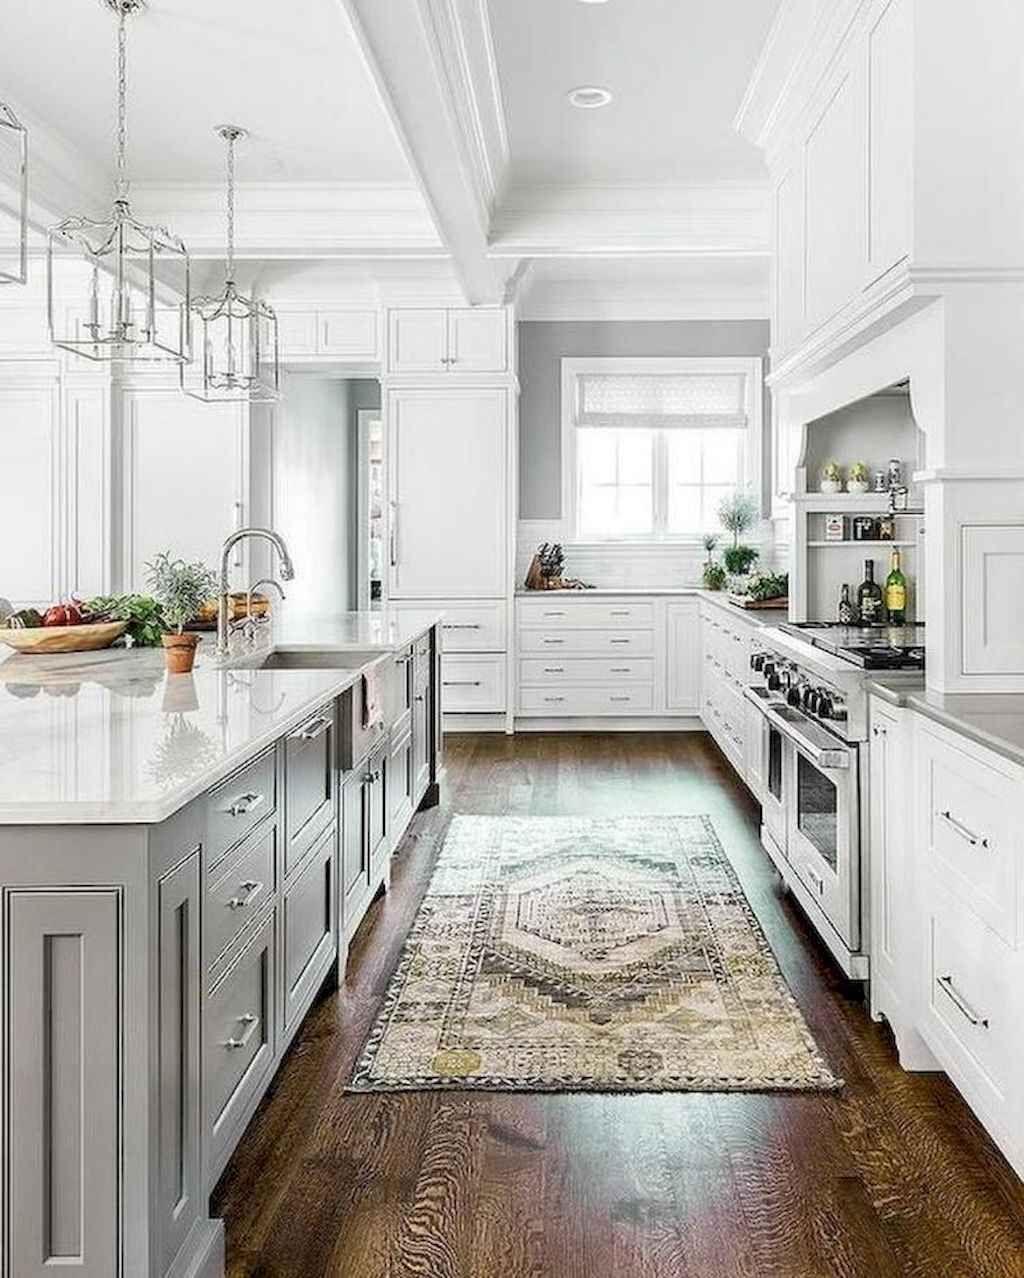 75 modern farmhouse kitchen cabinets makeover ideas farmhouse kitchen cabinets kitchen on farmhouse kitchen hutch id=83798